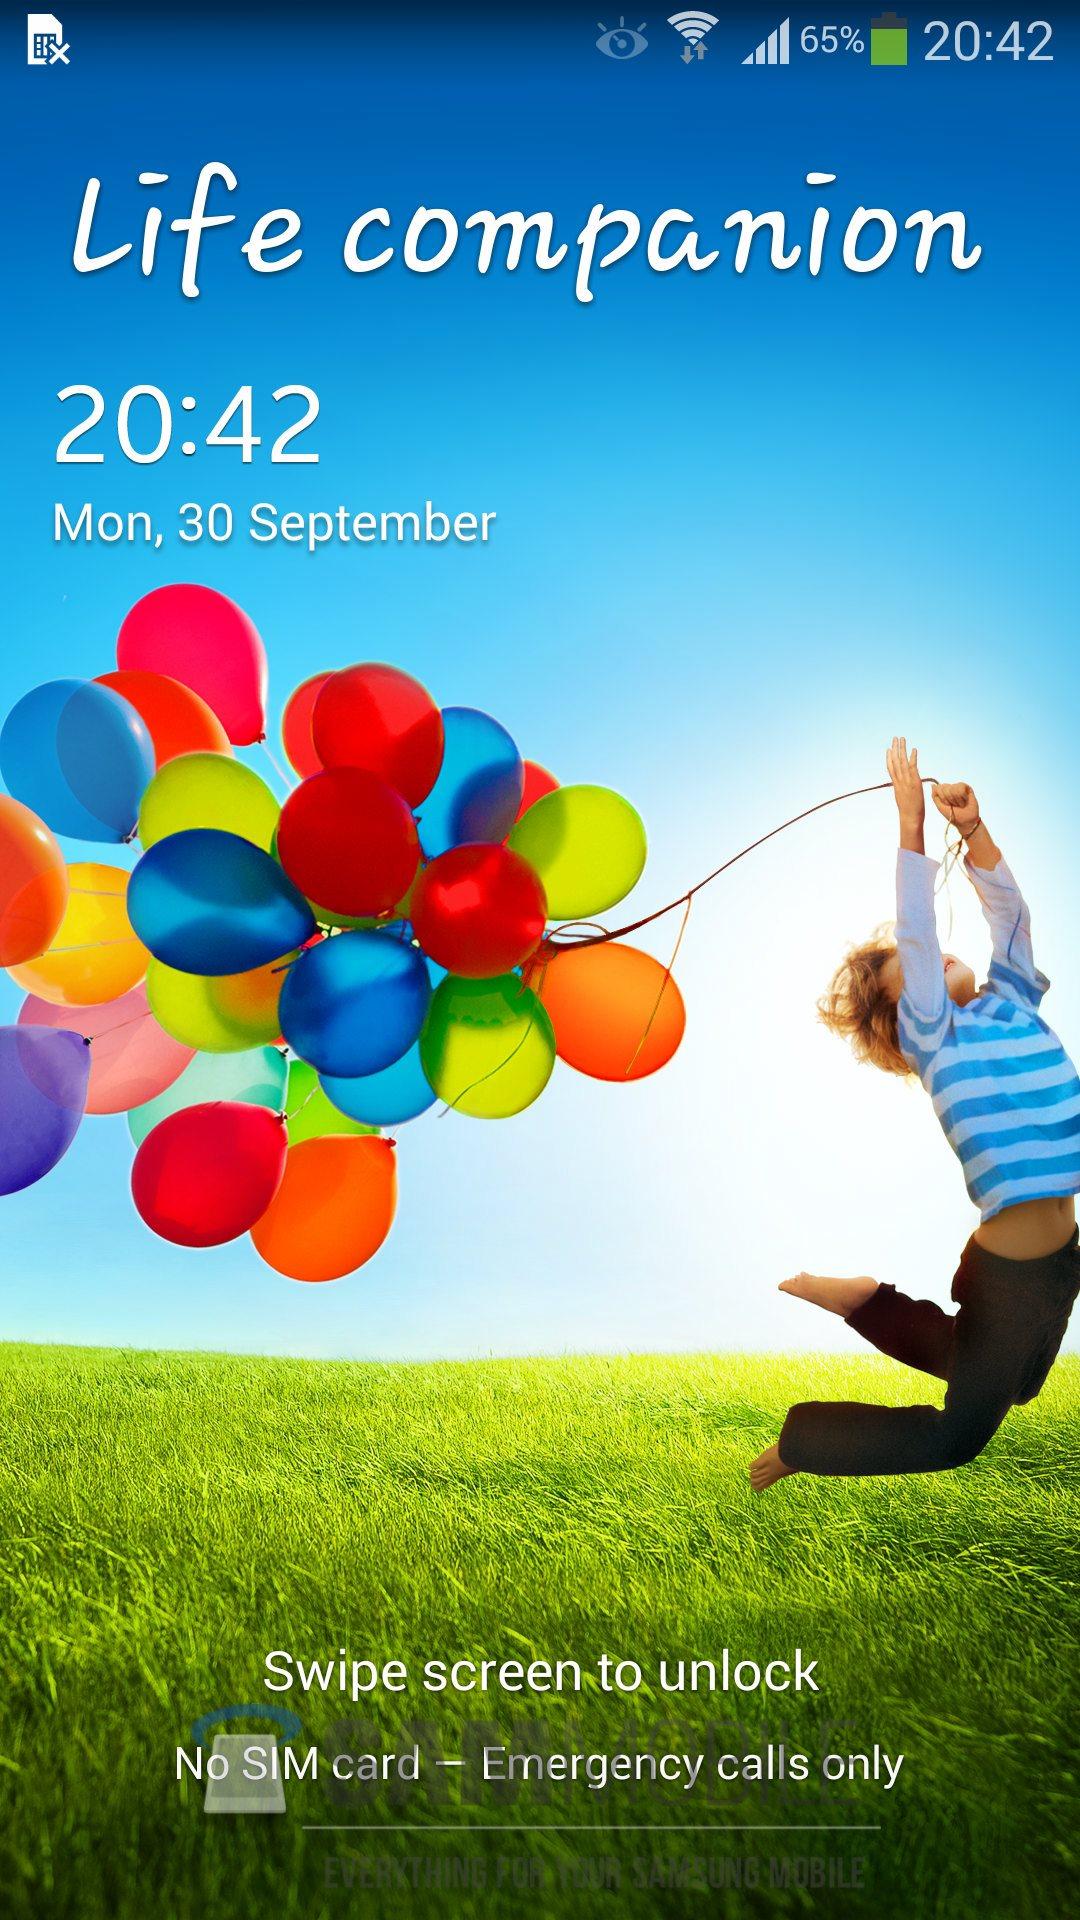 Android4.3_Samsung_Galaxy_S4_XXUEMI8 (4)